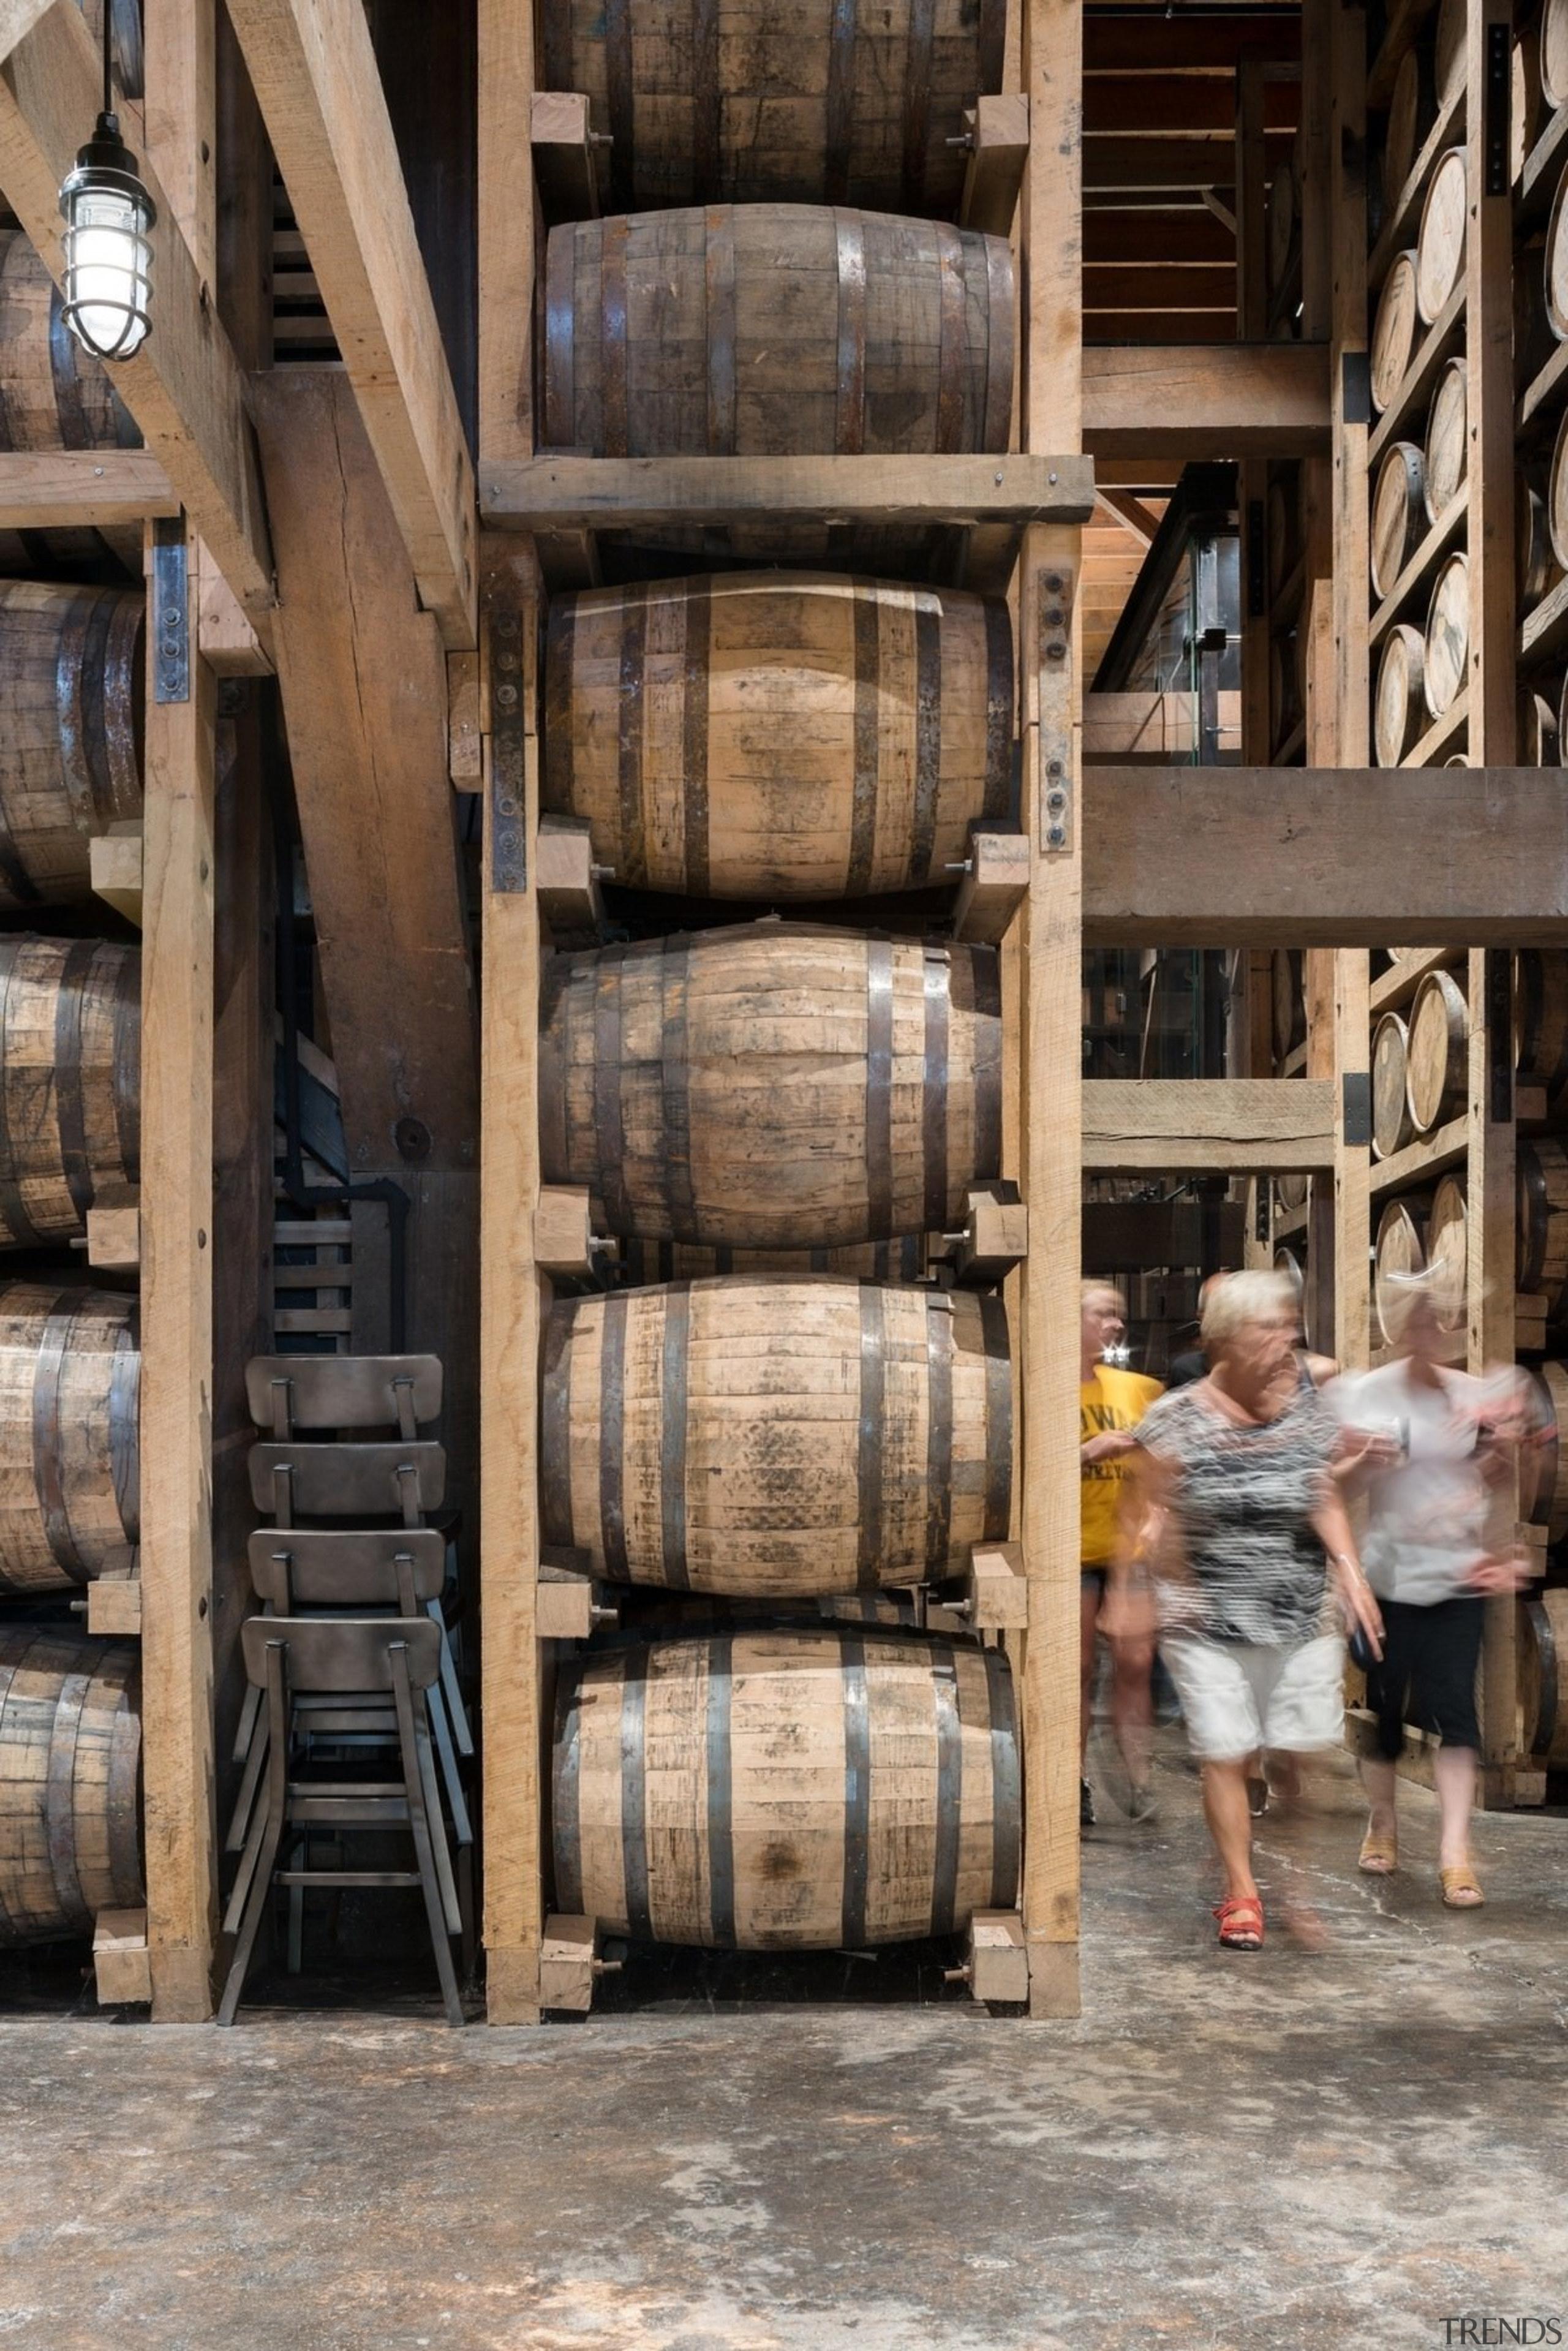 Barrel house - Barrel house - wood | wood, black, gray